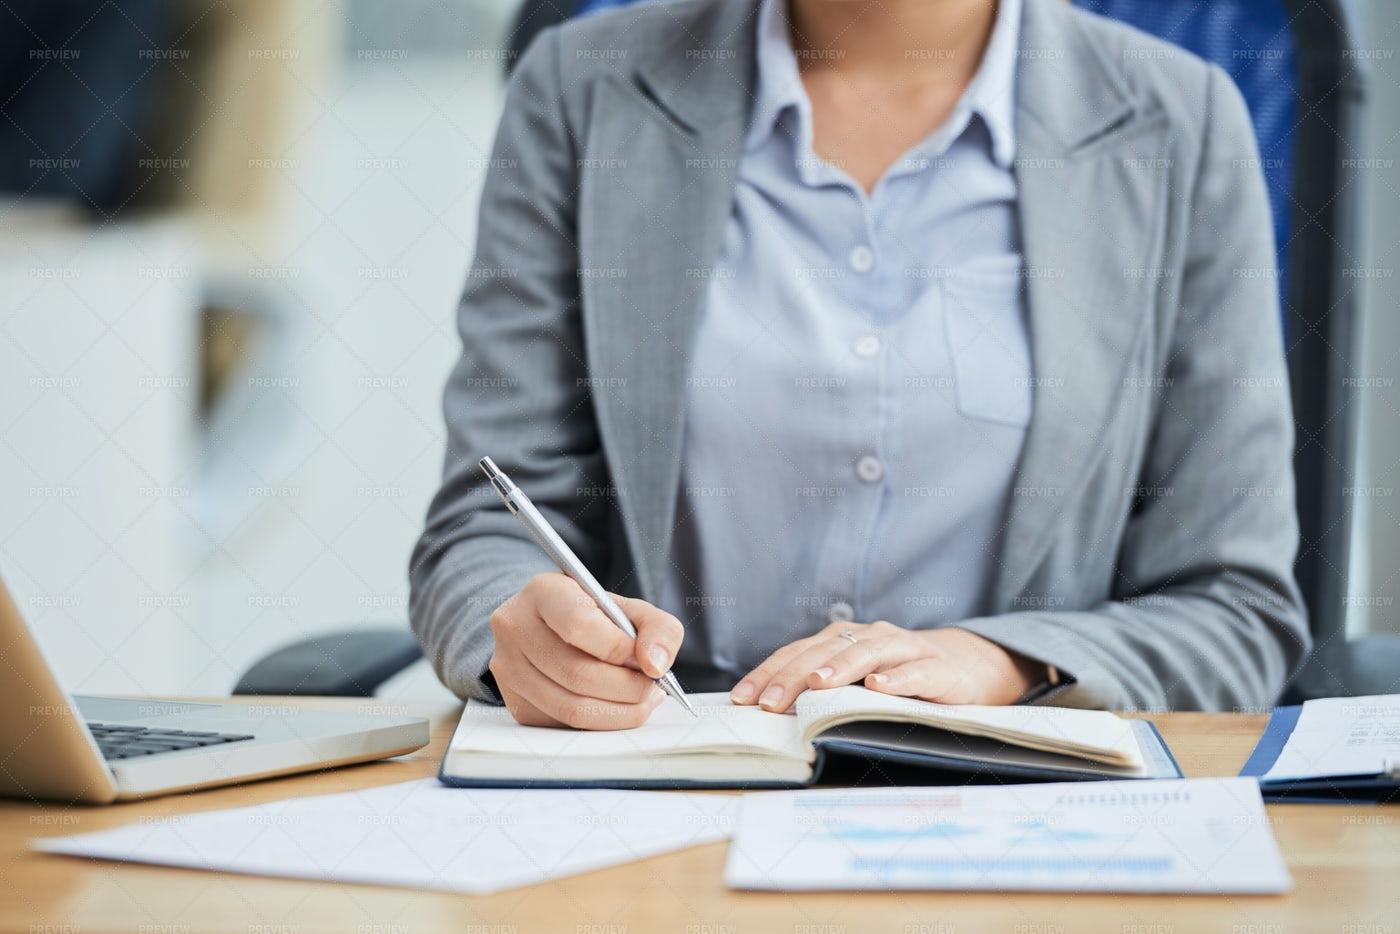 Businesswoman Planning Her Work: Stock Photos